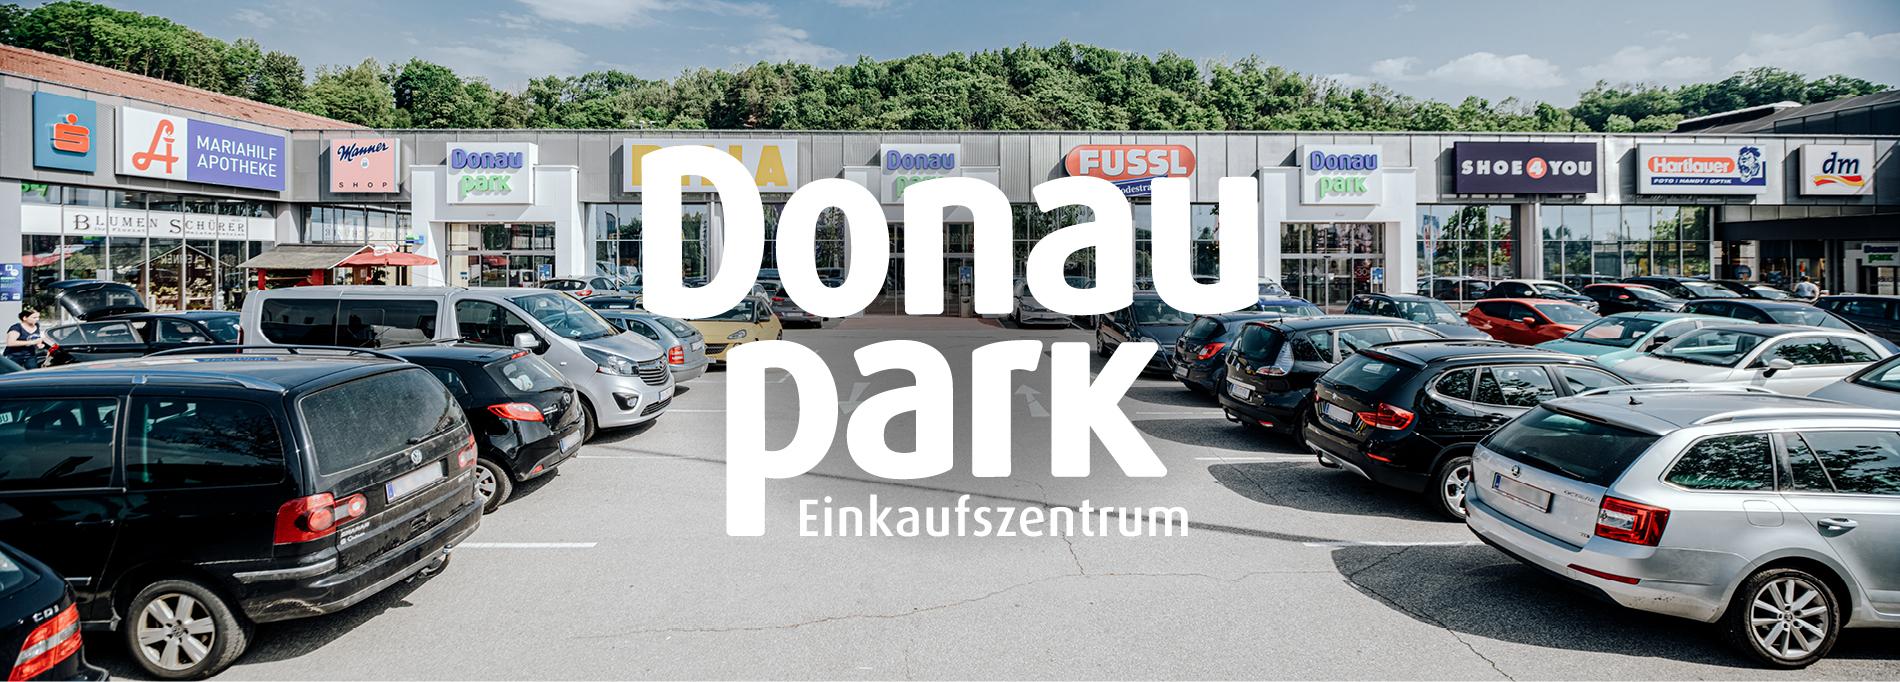 djw-donaupark-Logo